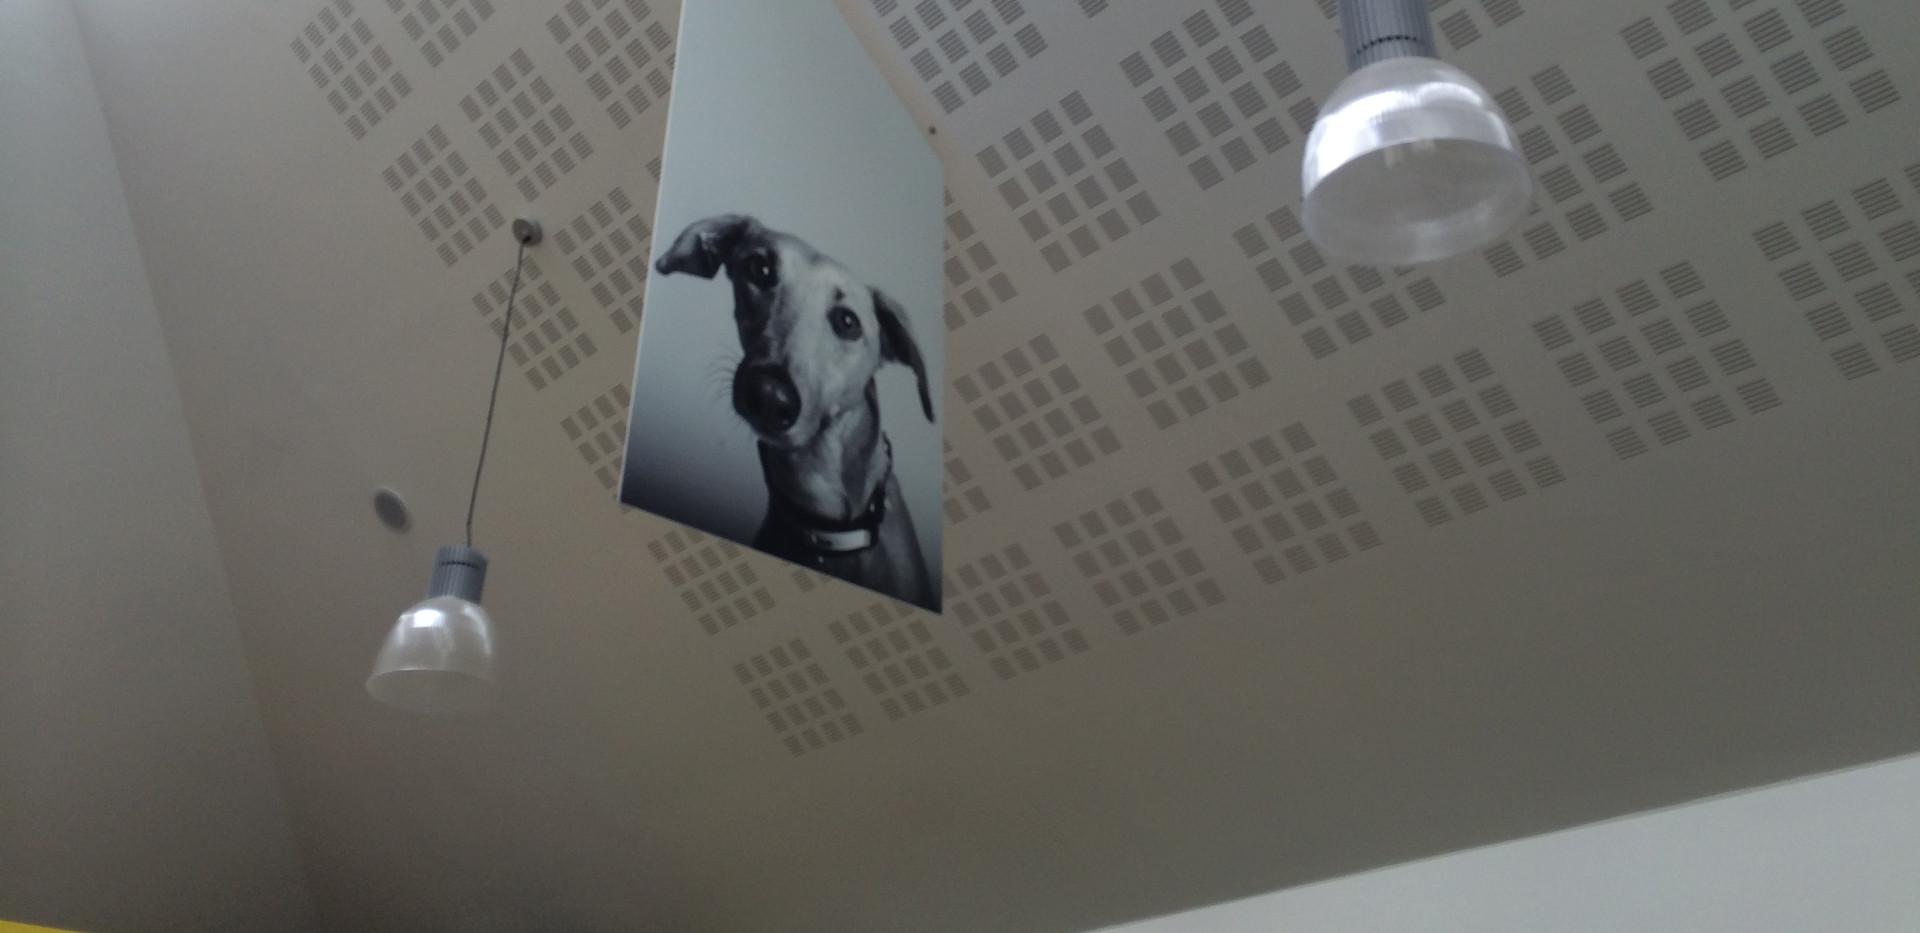 Hanging board